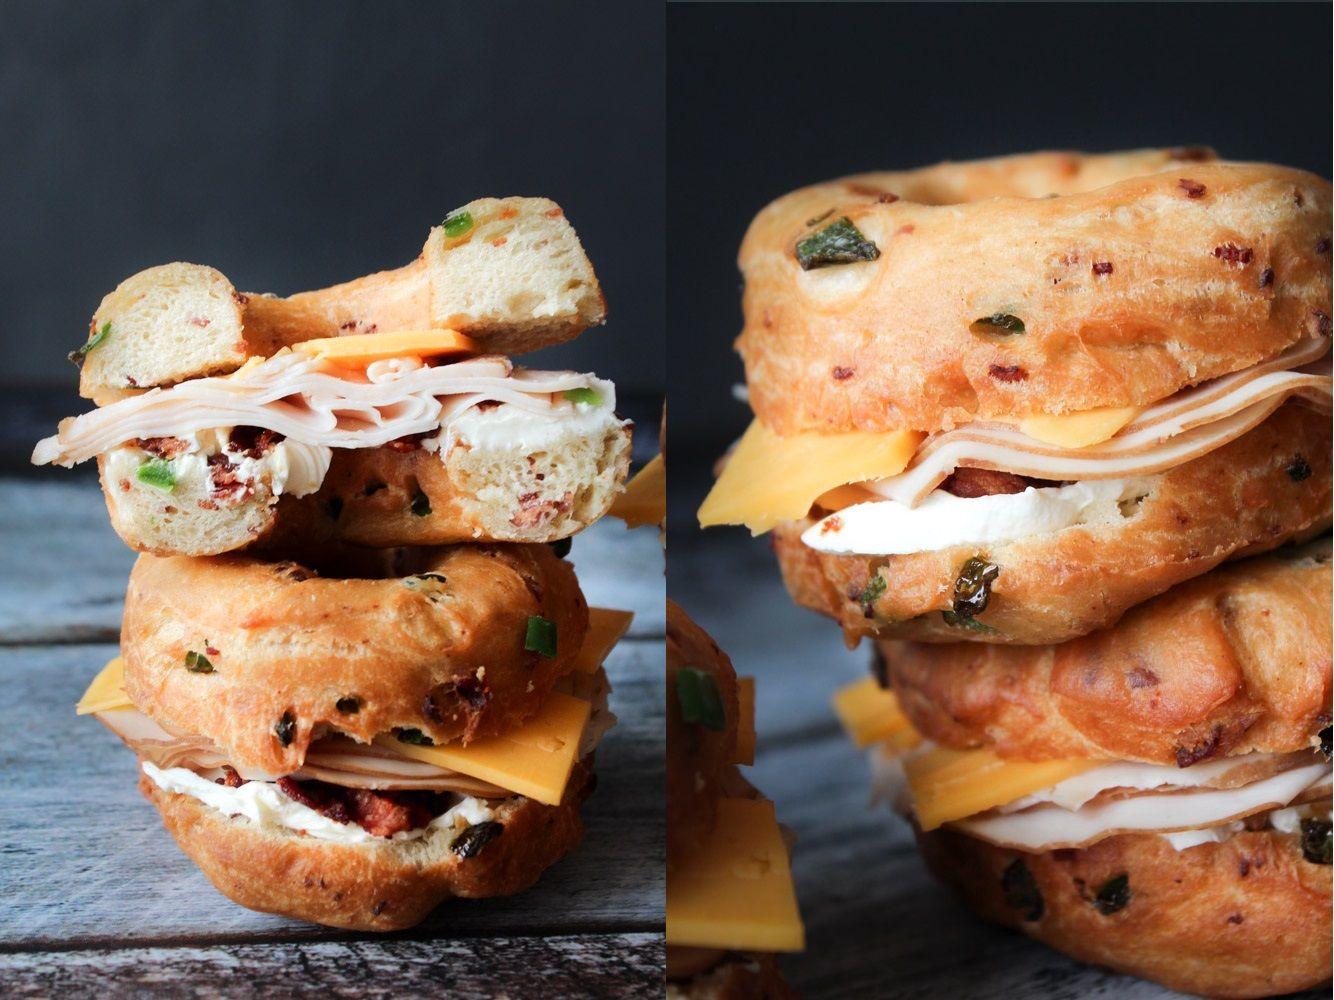 Homemade Savory Jalapeño Popper Donut Sandwiches [OC] [1334x1000] via Classy Bro